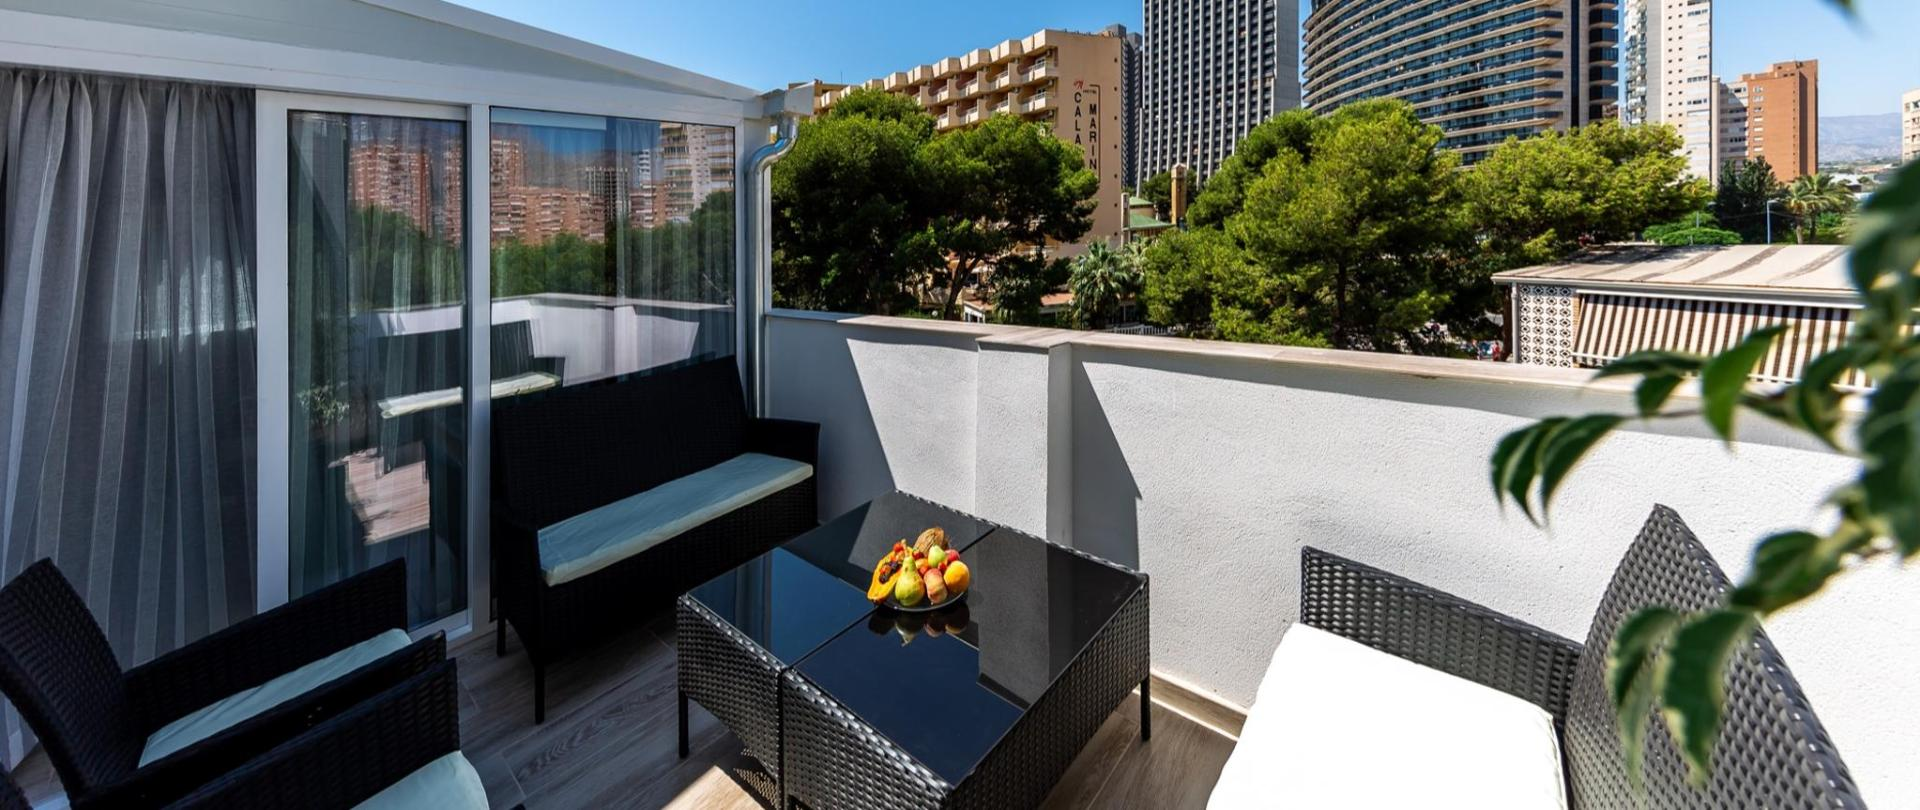 Sonrisa Apartments - Penthouse17.jpg